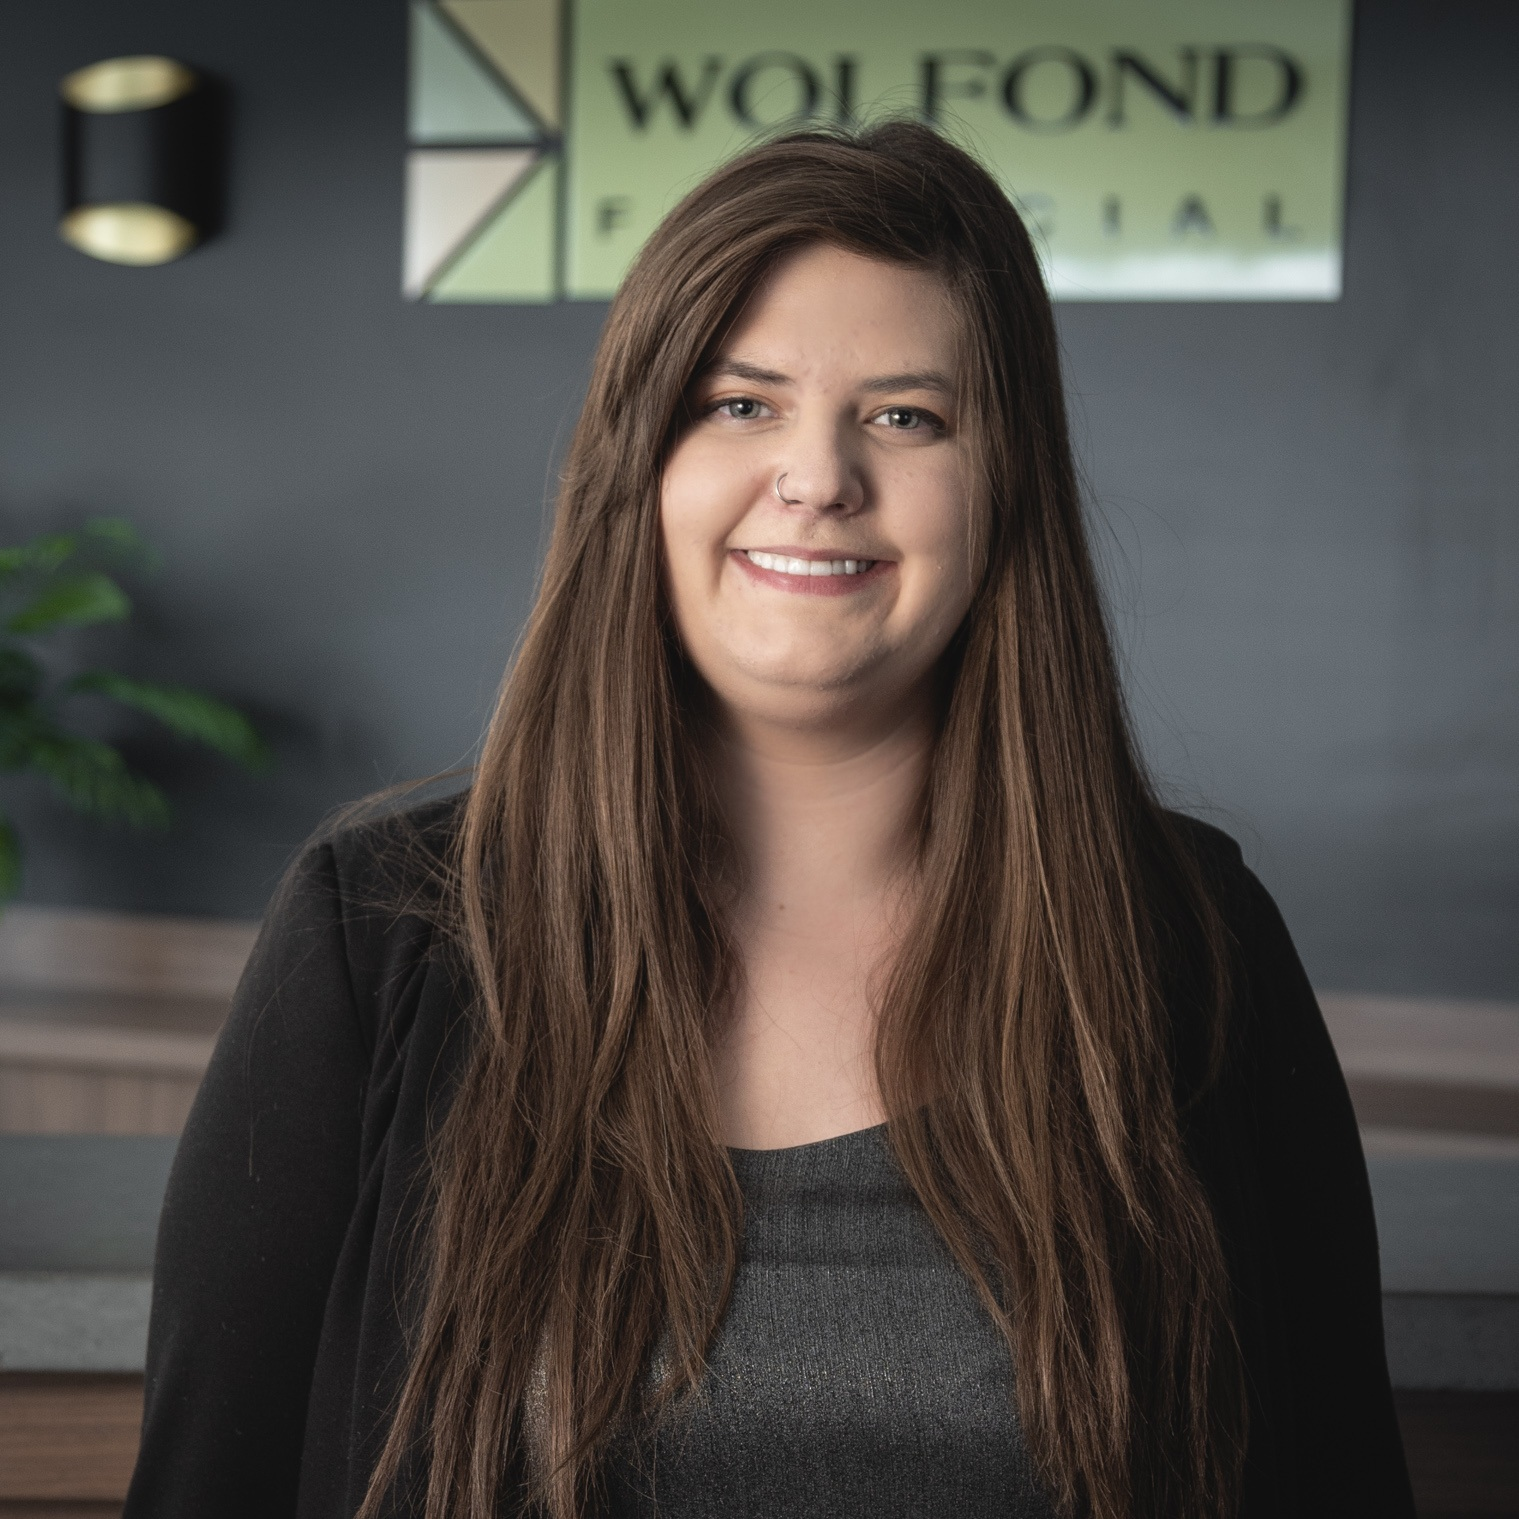 Kaitlyn+Doidge+-+Wolfond+Financial+Planning+Regina+Saskatchewan